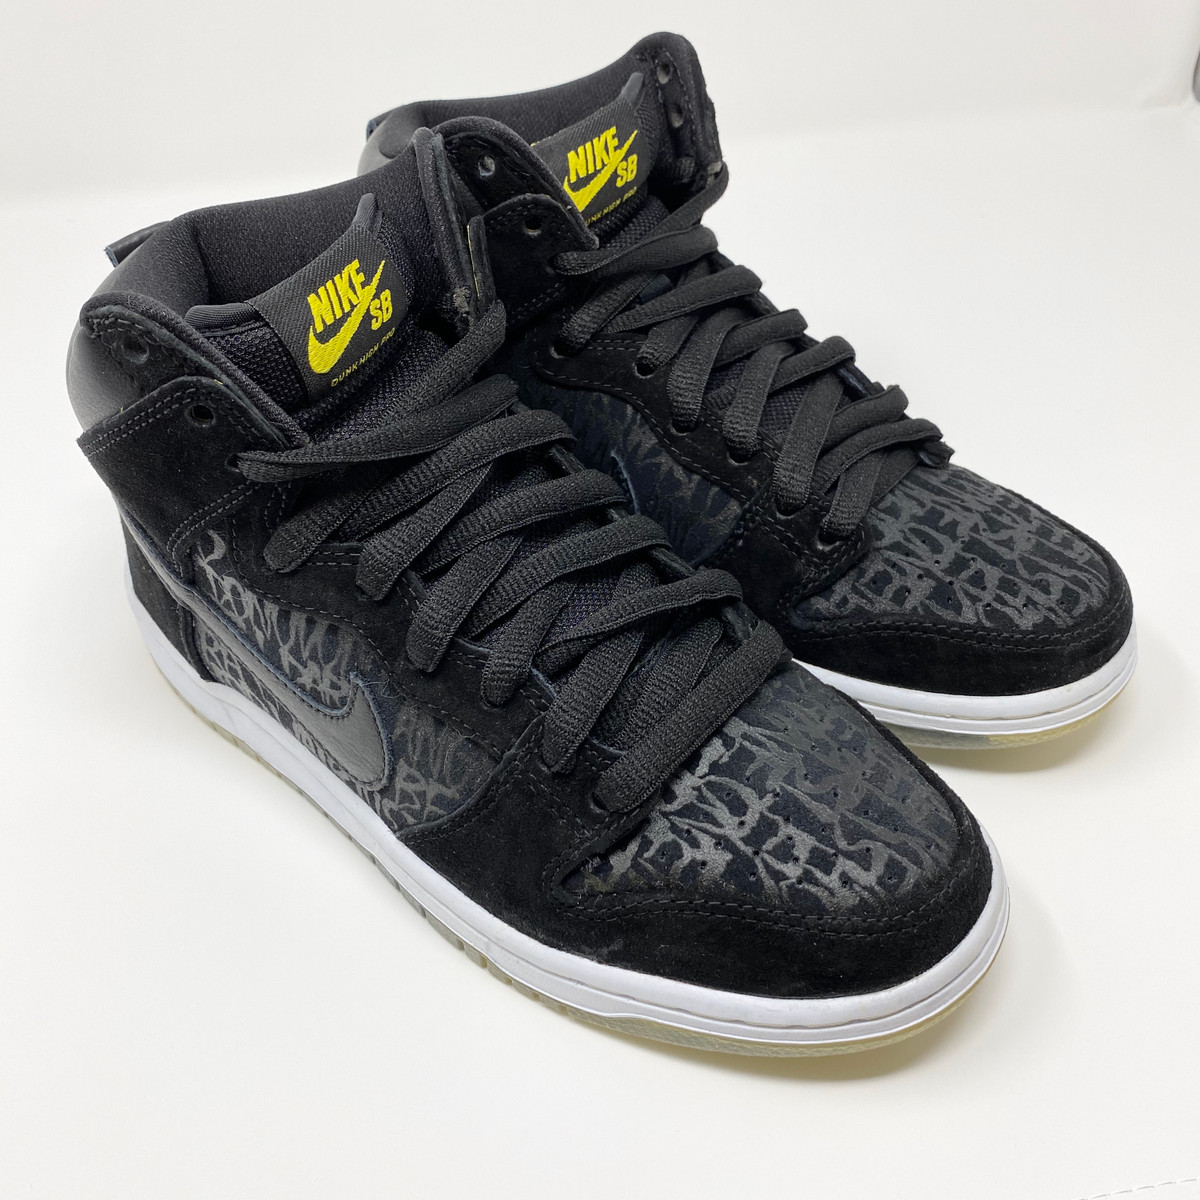 Nike Dunk Hi Prem SB Neckface